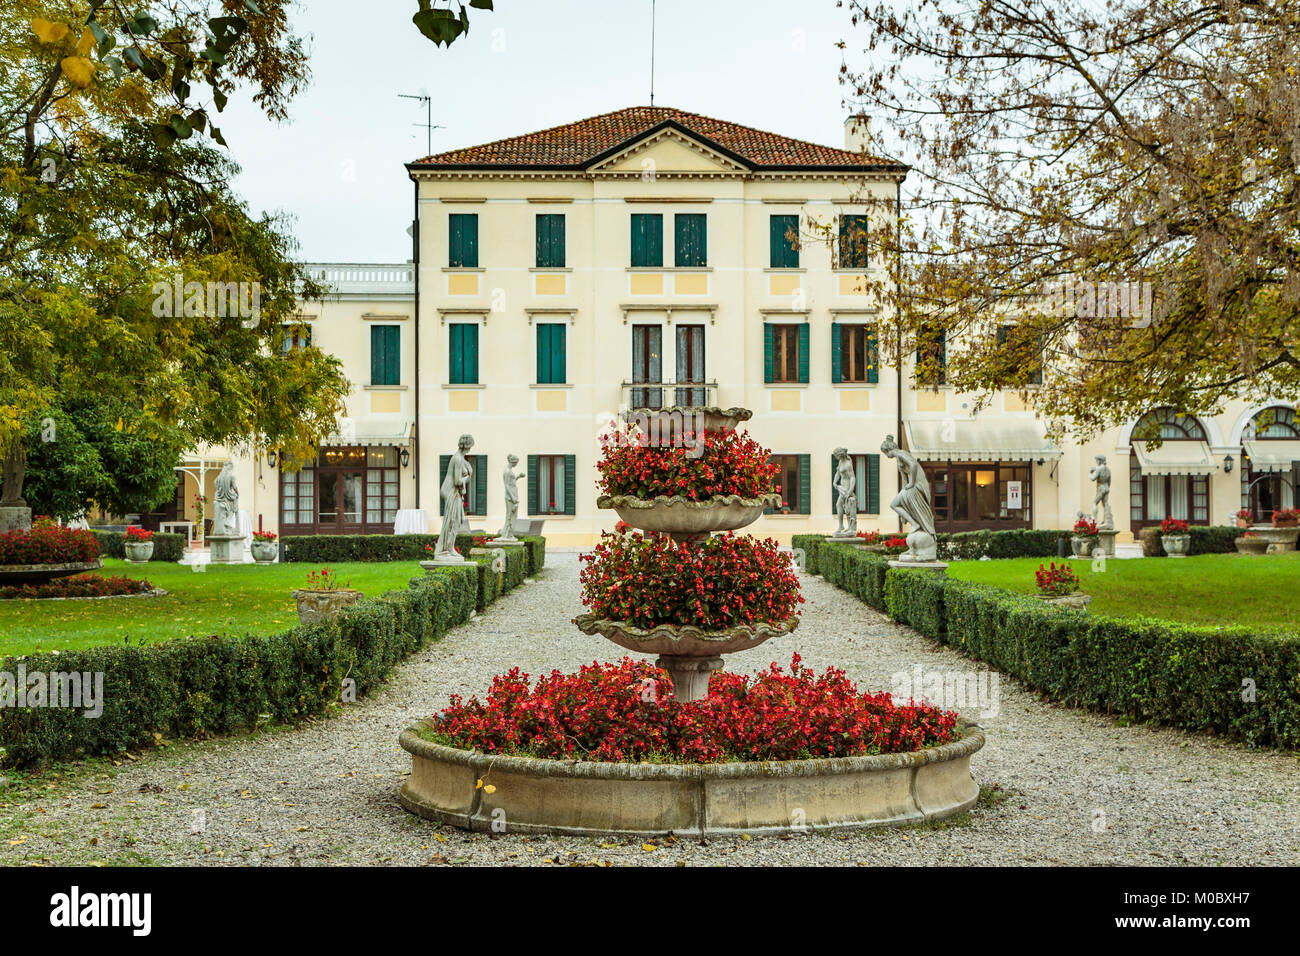 Das Hotel Villa Braida in Mogliano Veneto, Venedig, Italien, Europa. Stockbild